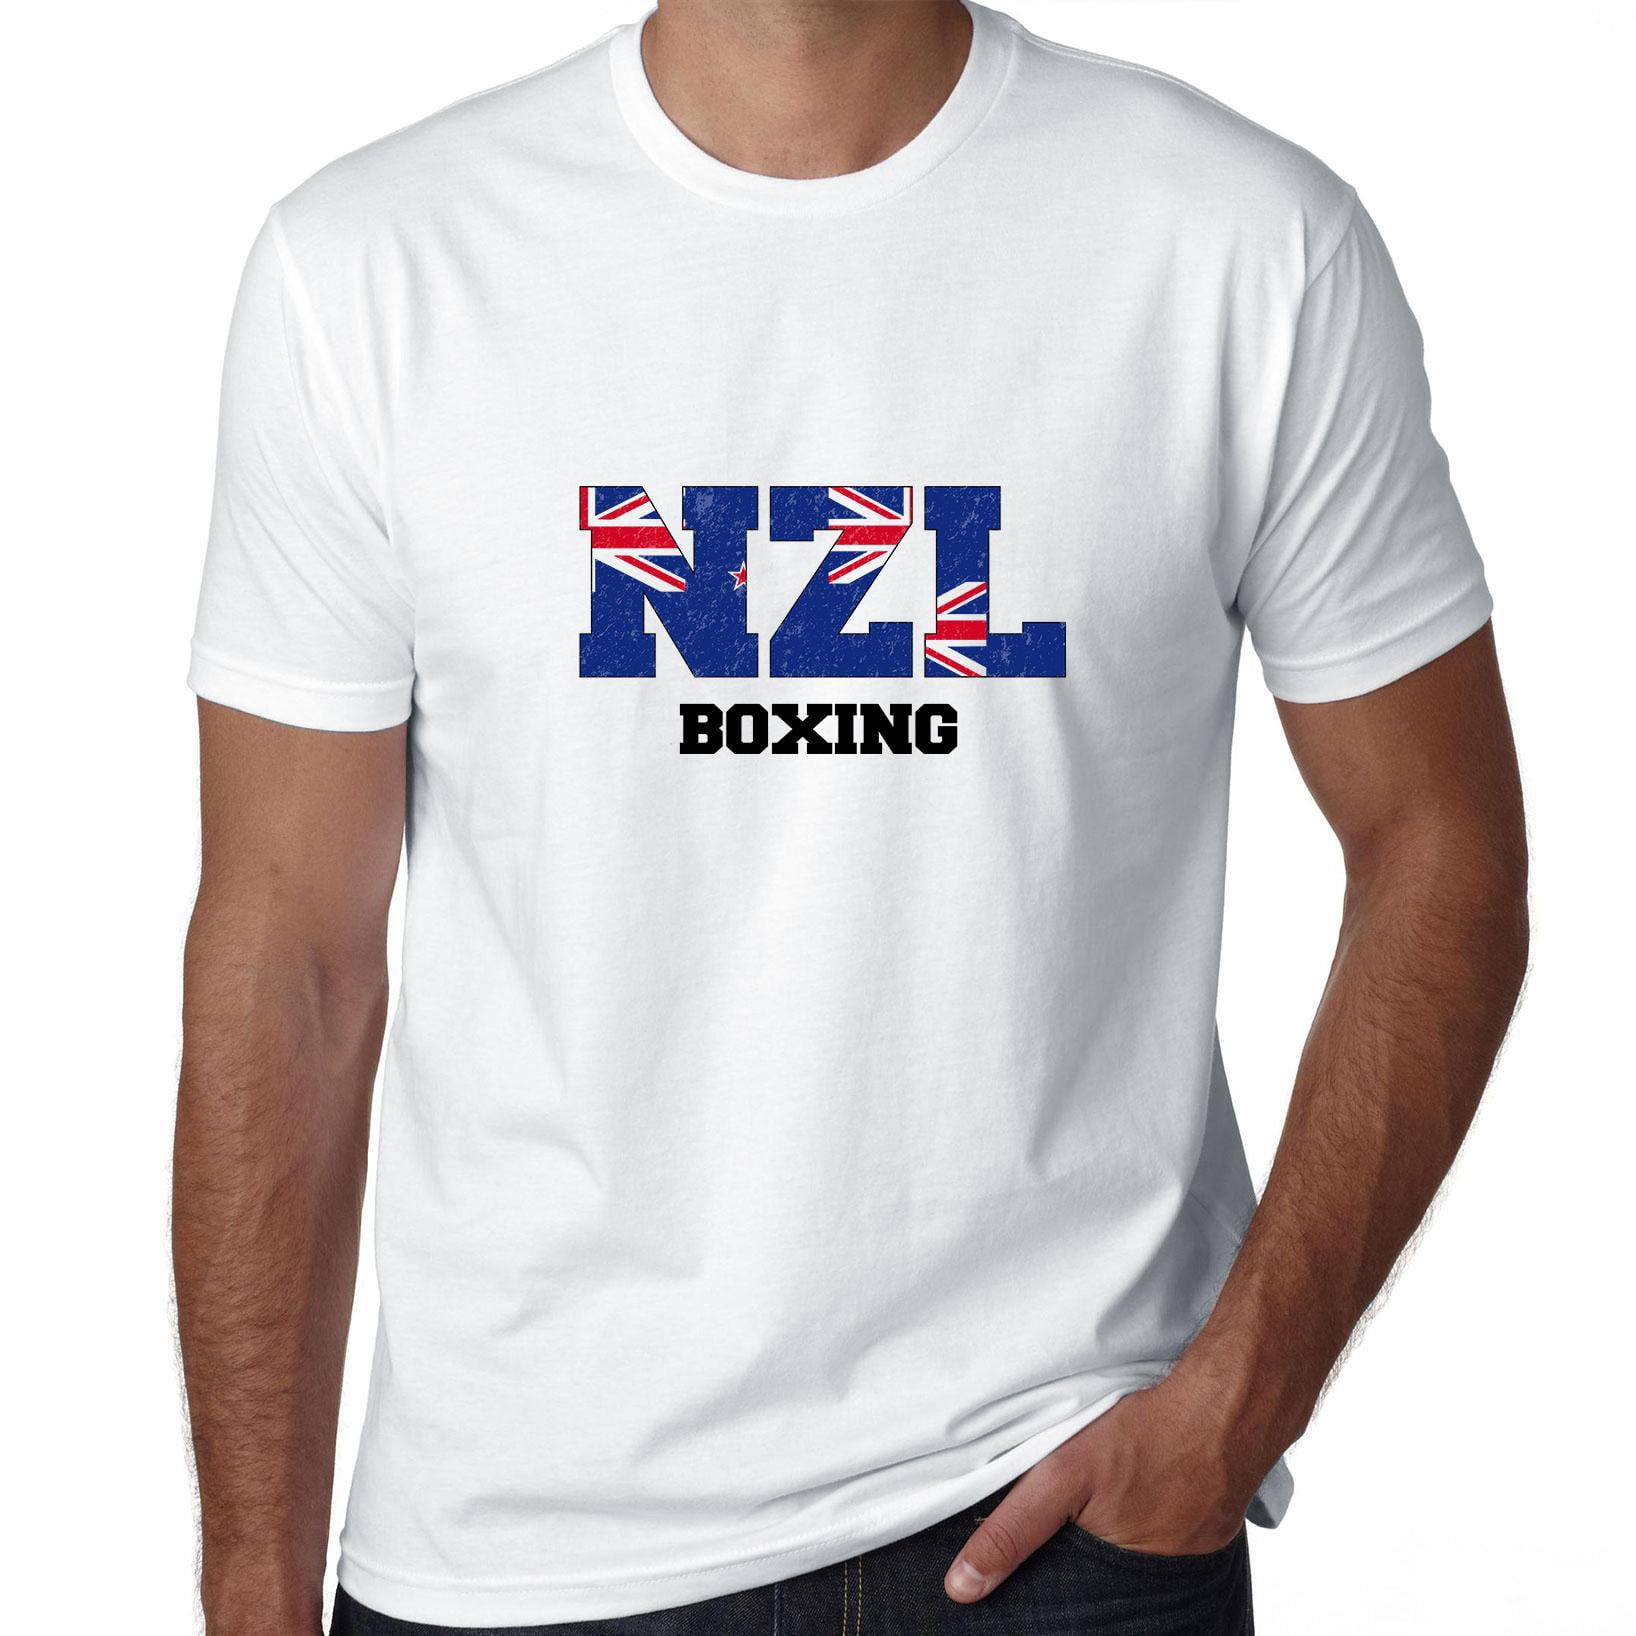 New zealand Boxing - Olympic Games - Rio - Flag Men's T-Shirt